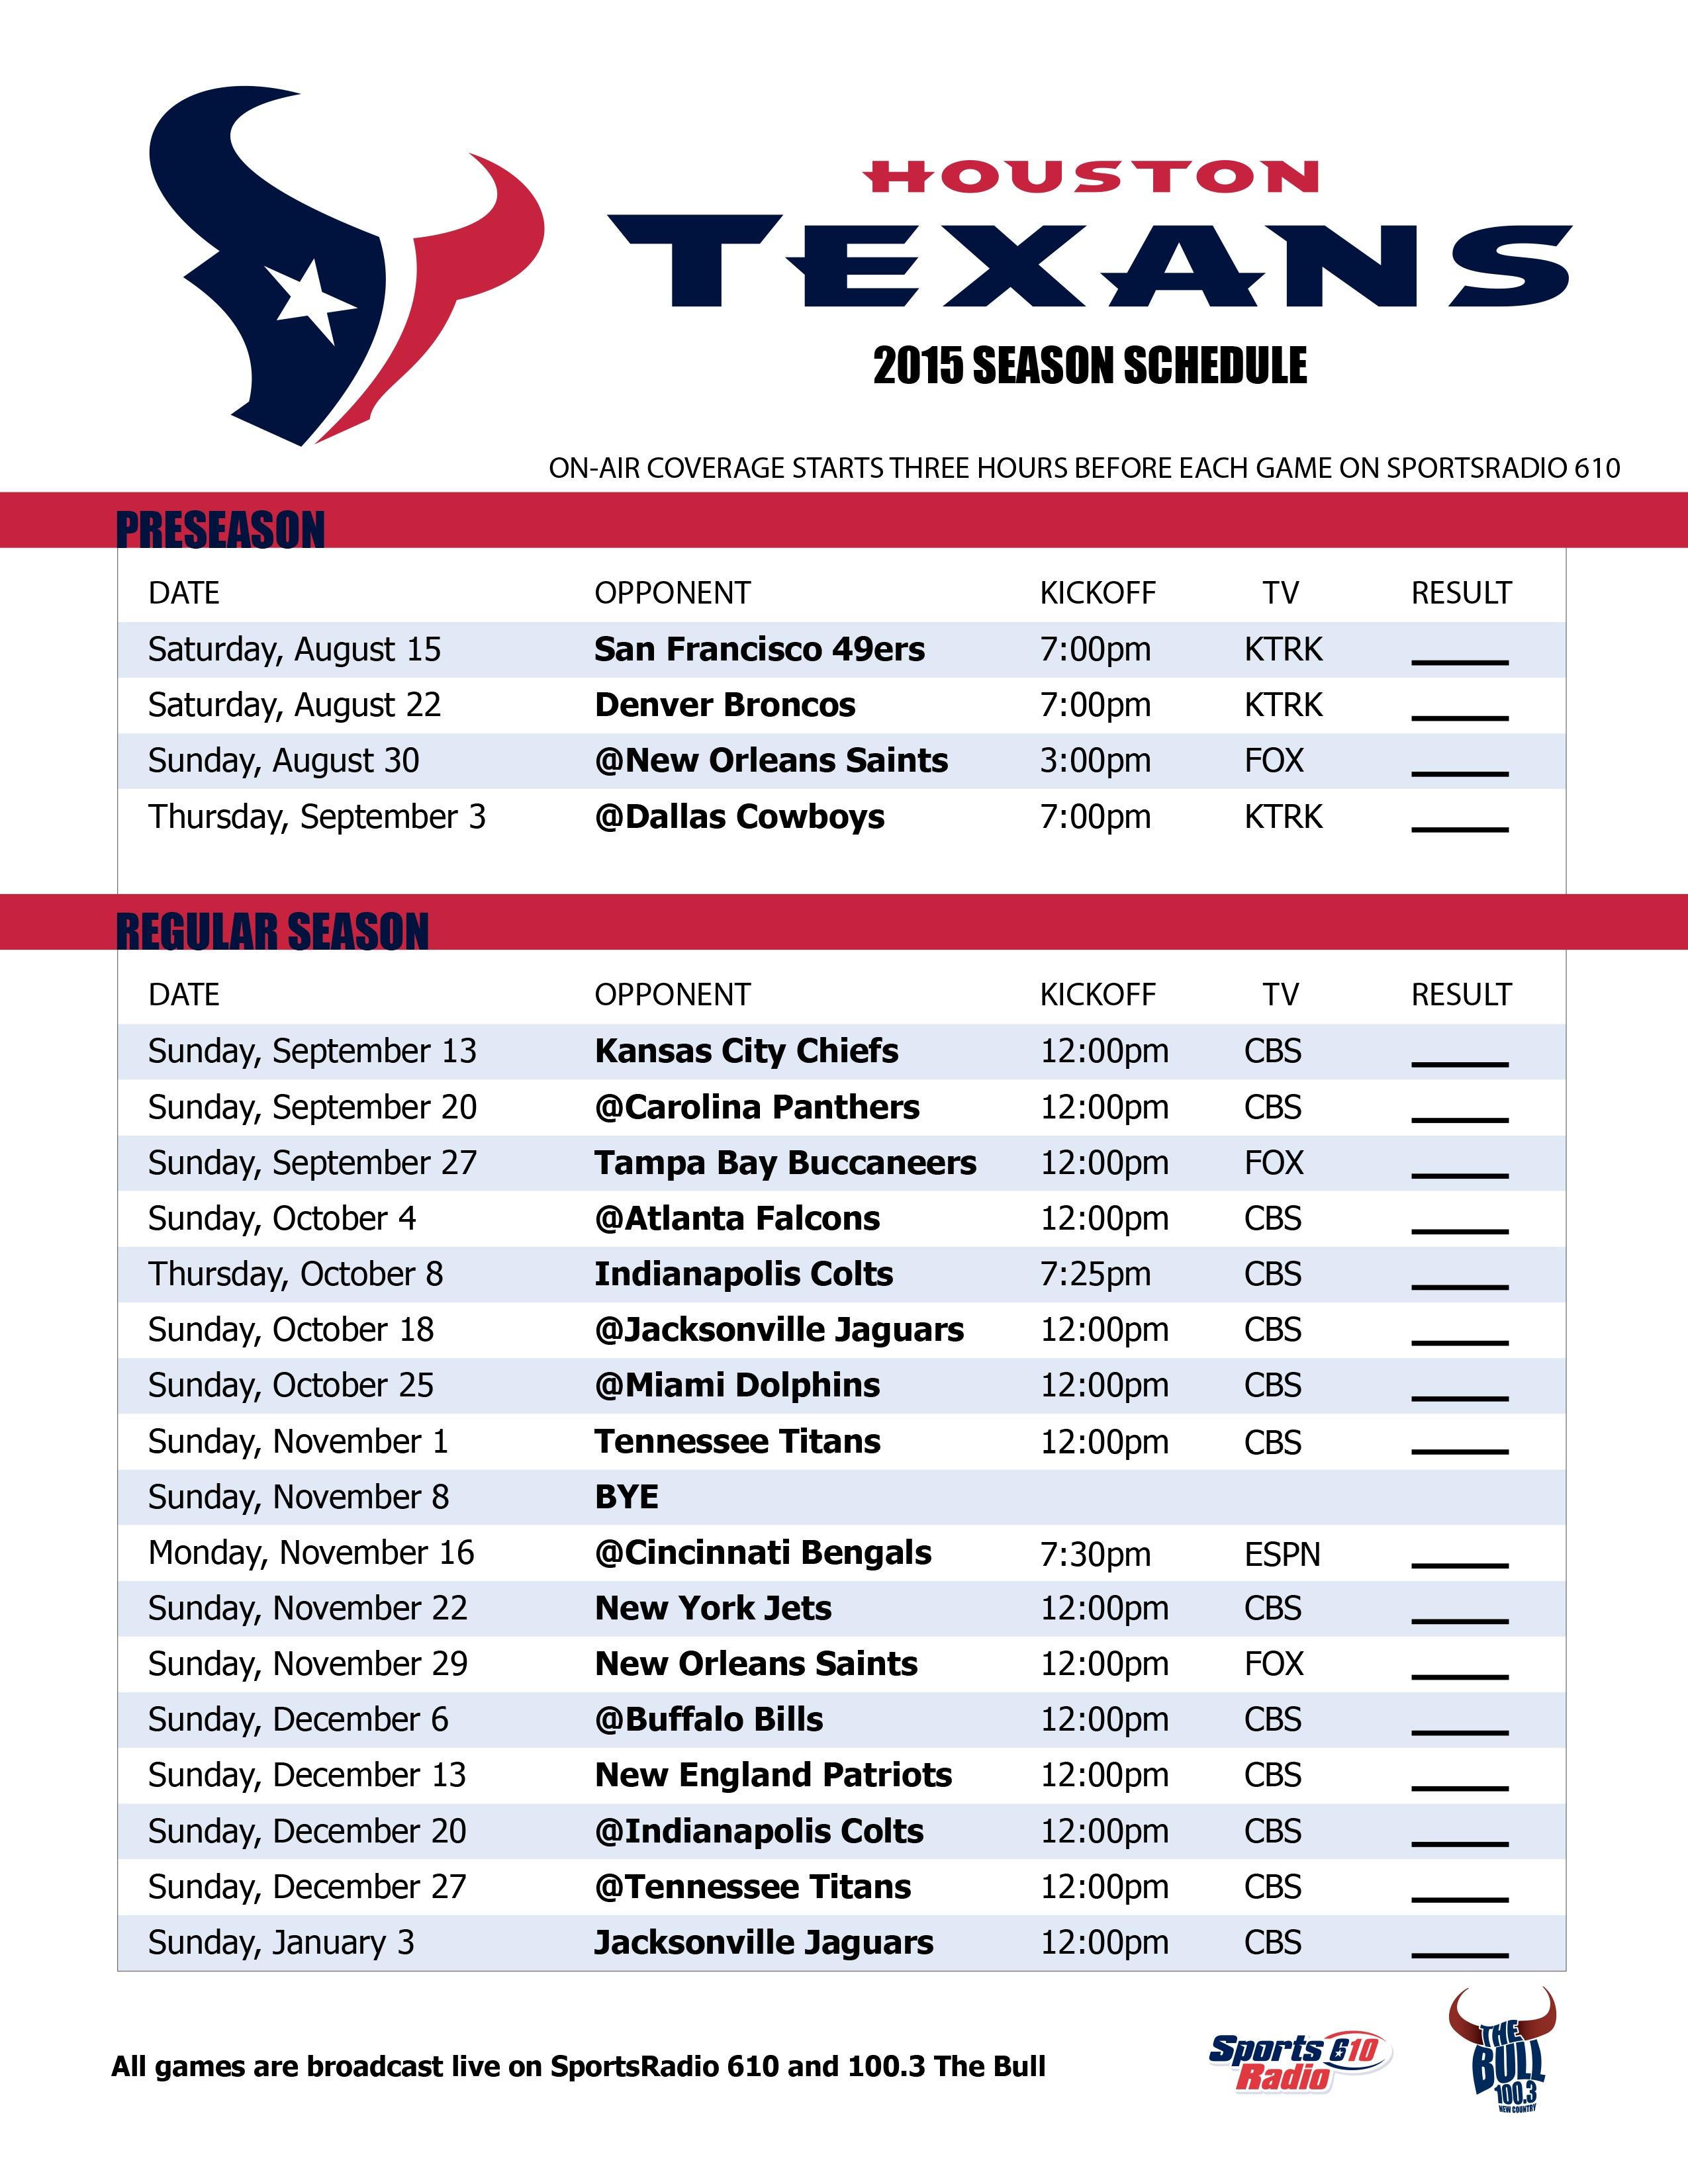 houston texans schedule 2015 2550x3300